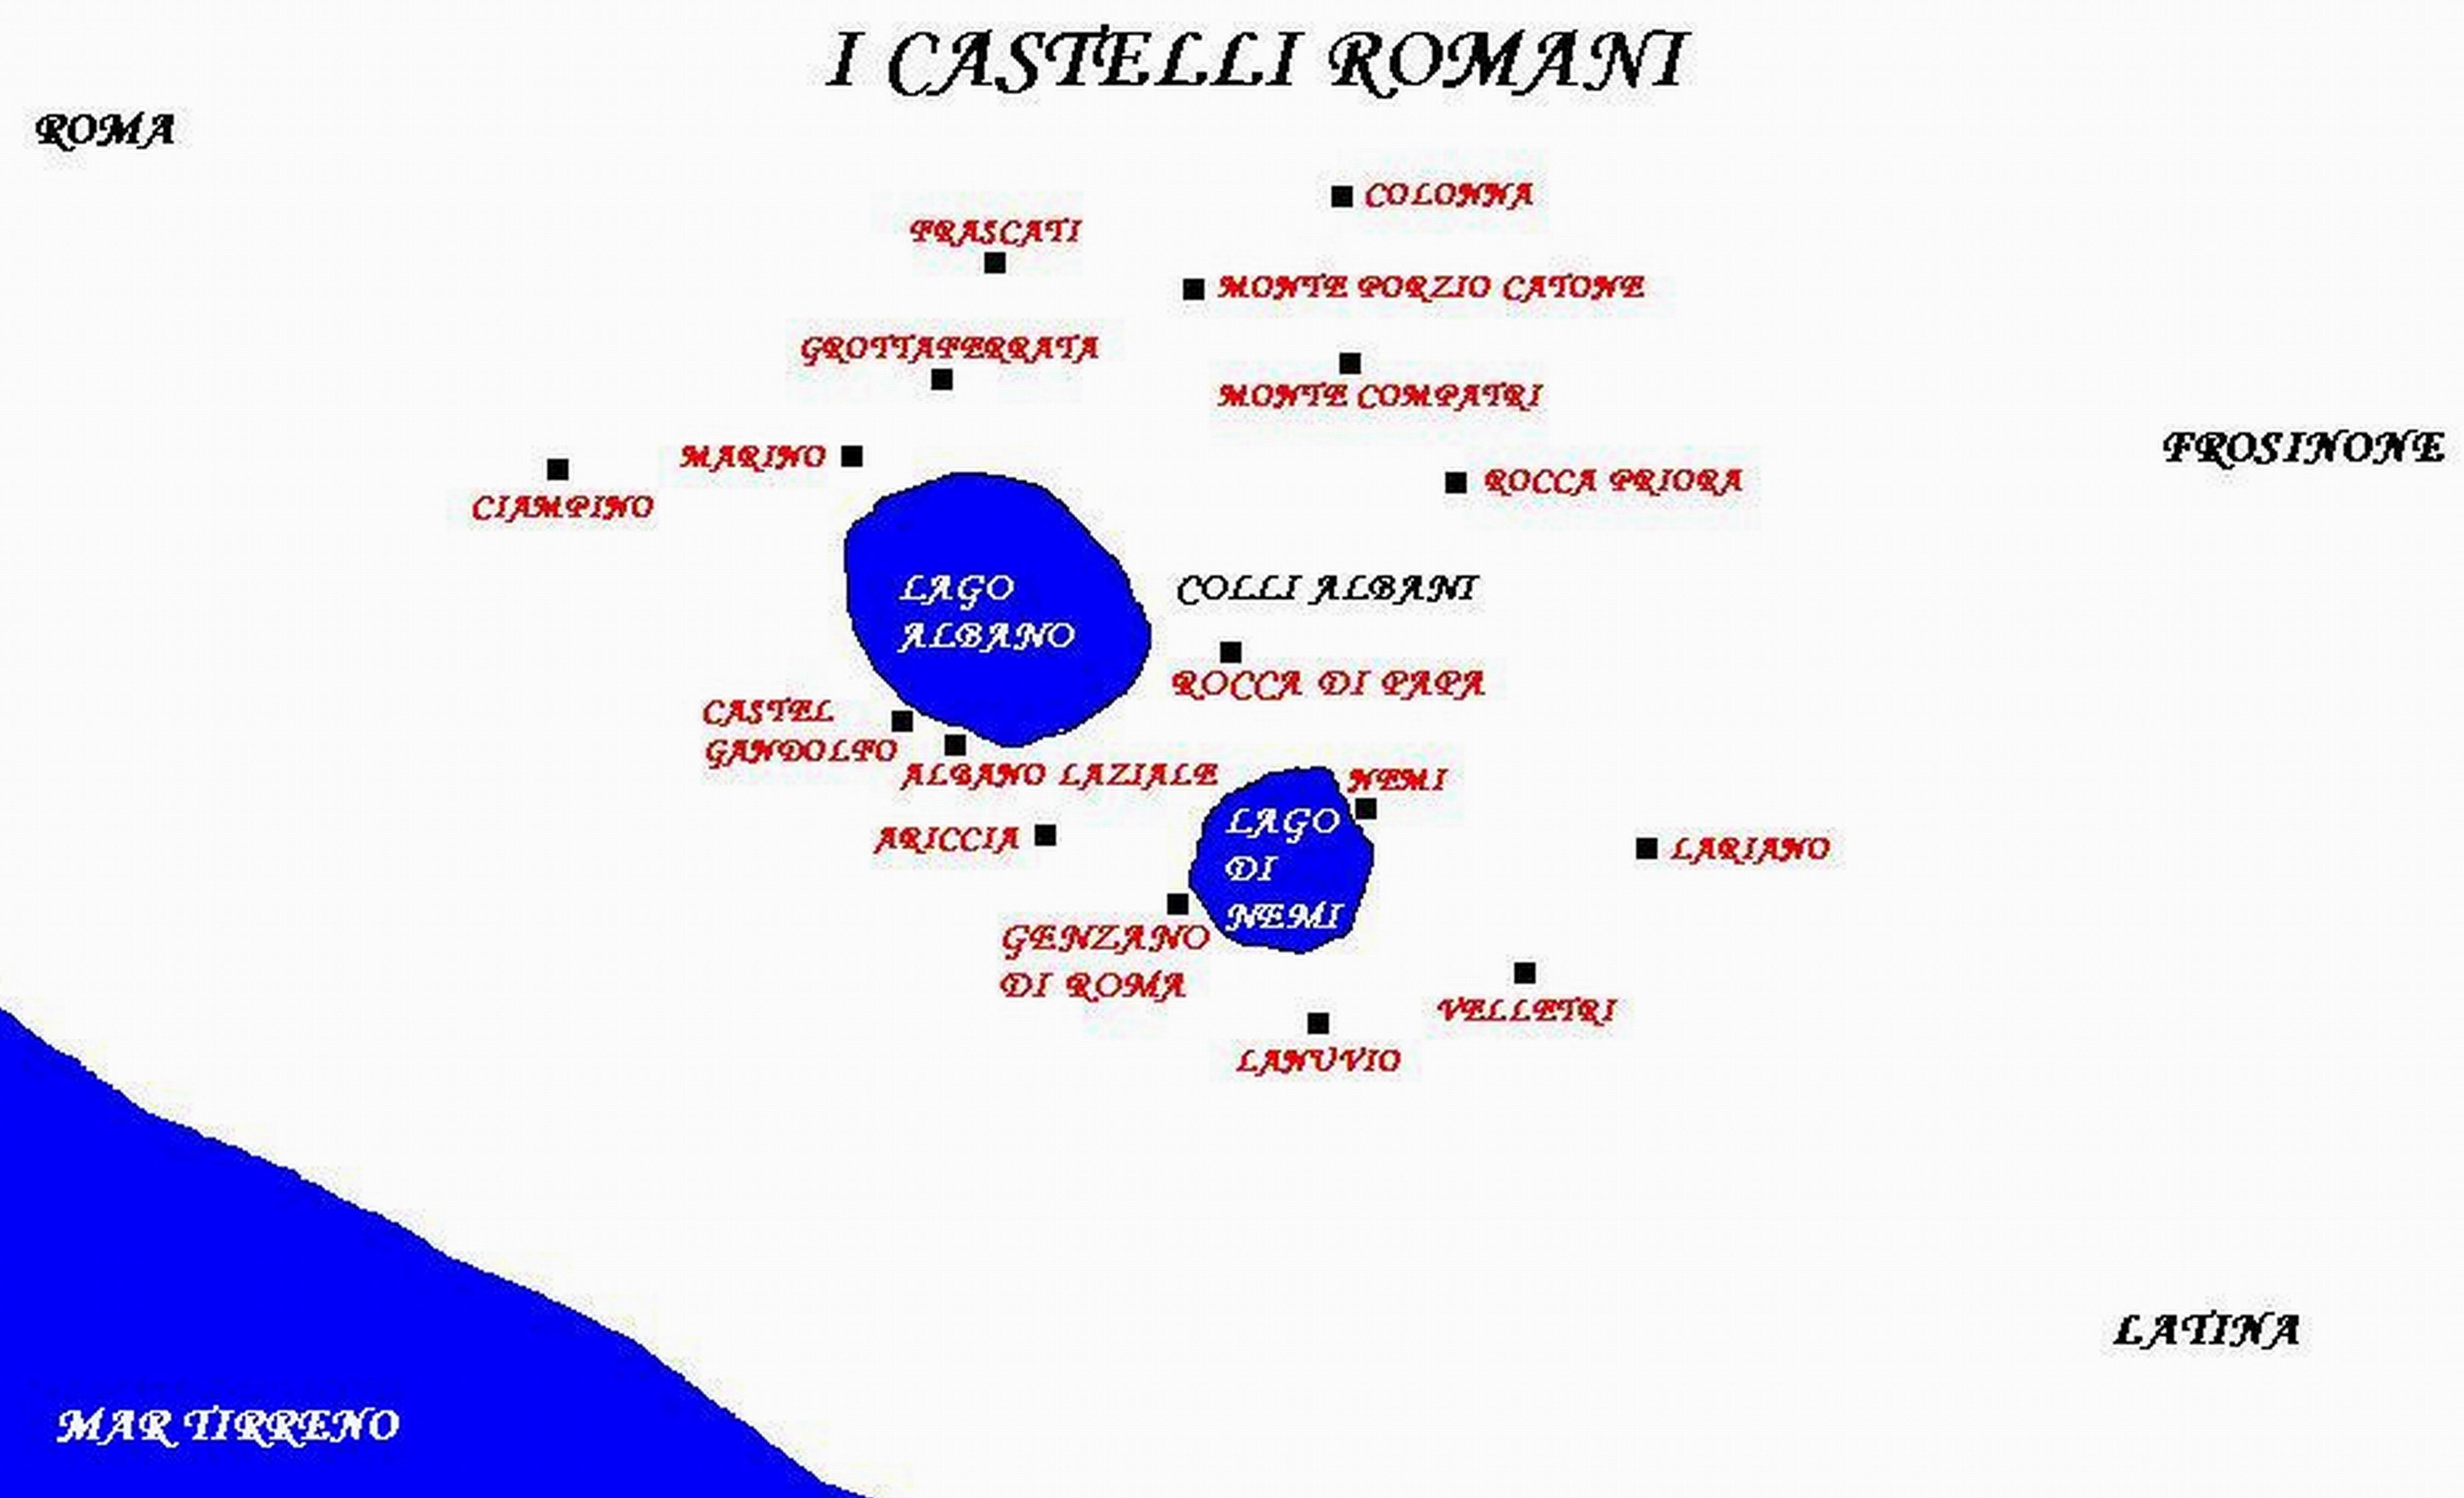 Colli Di Roma Cartina.File Cartina Castelli Romani Jpg Wikipedia